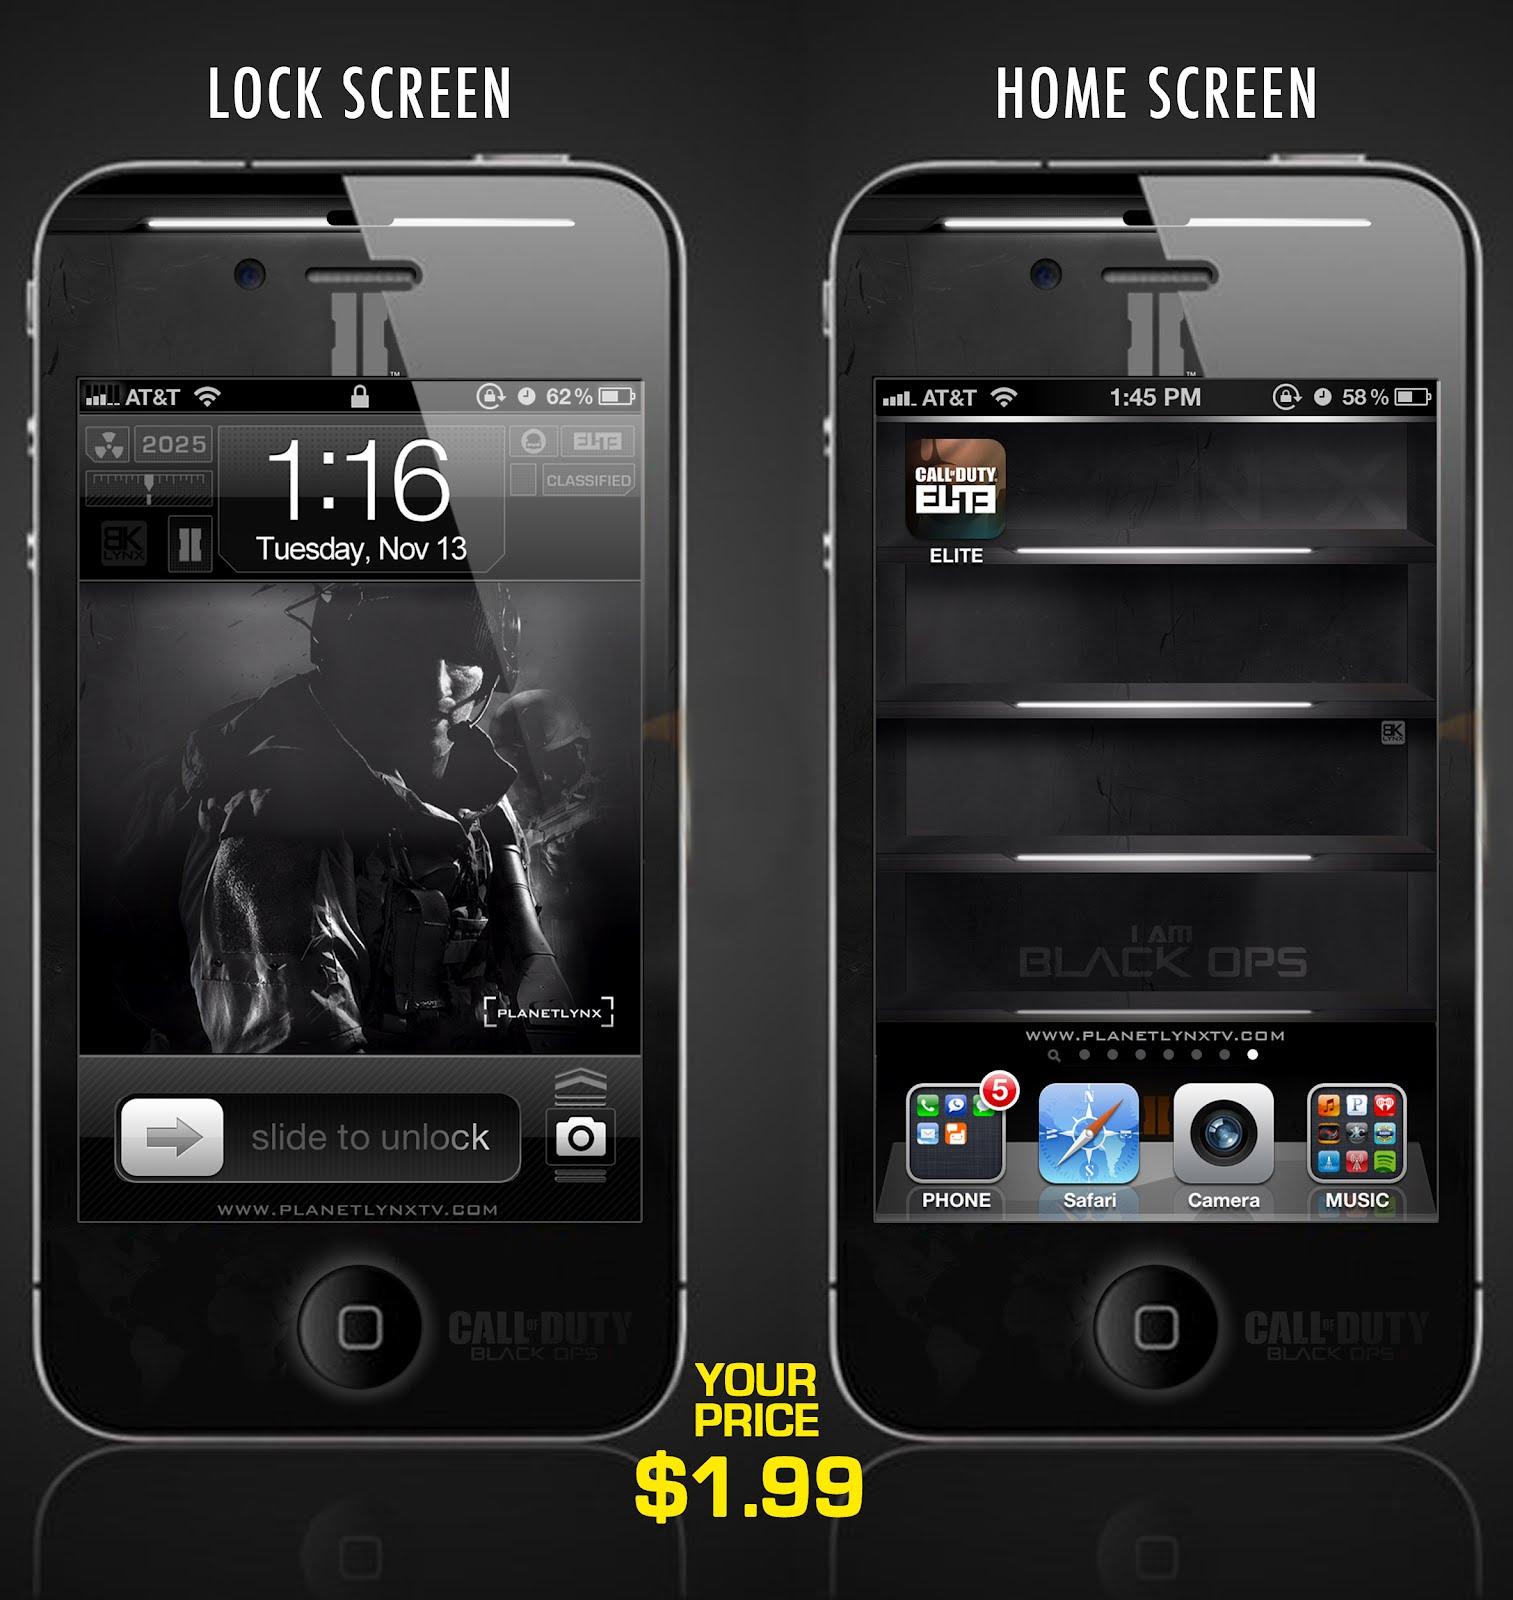 Iphone Wallpaper Enlarges: PLANETLYNX SHOP